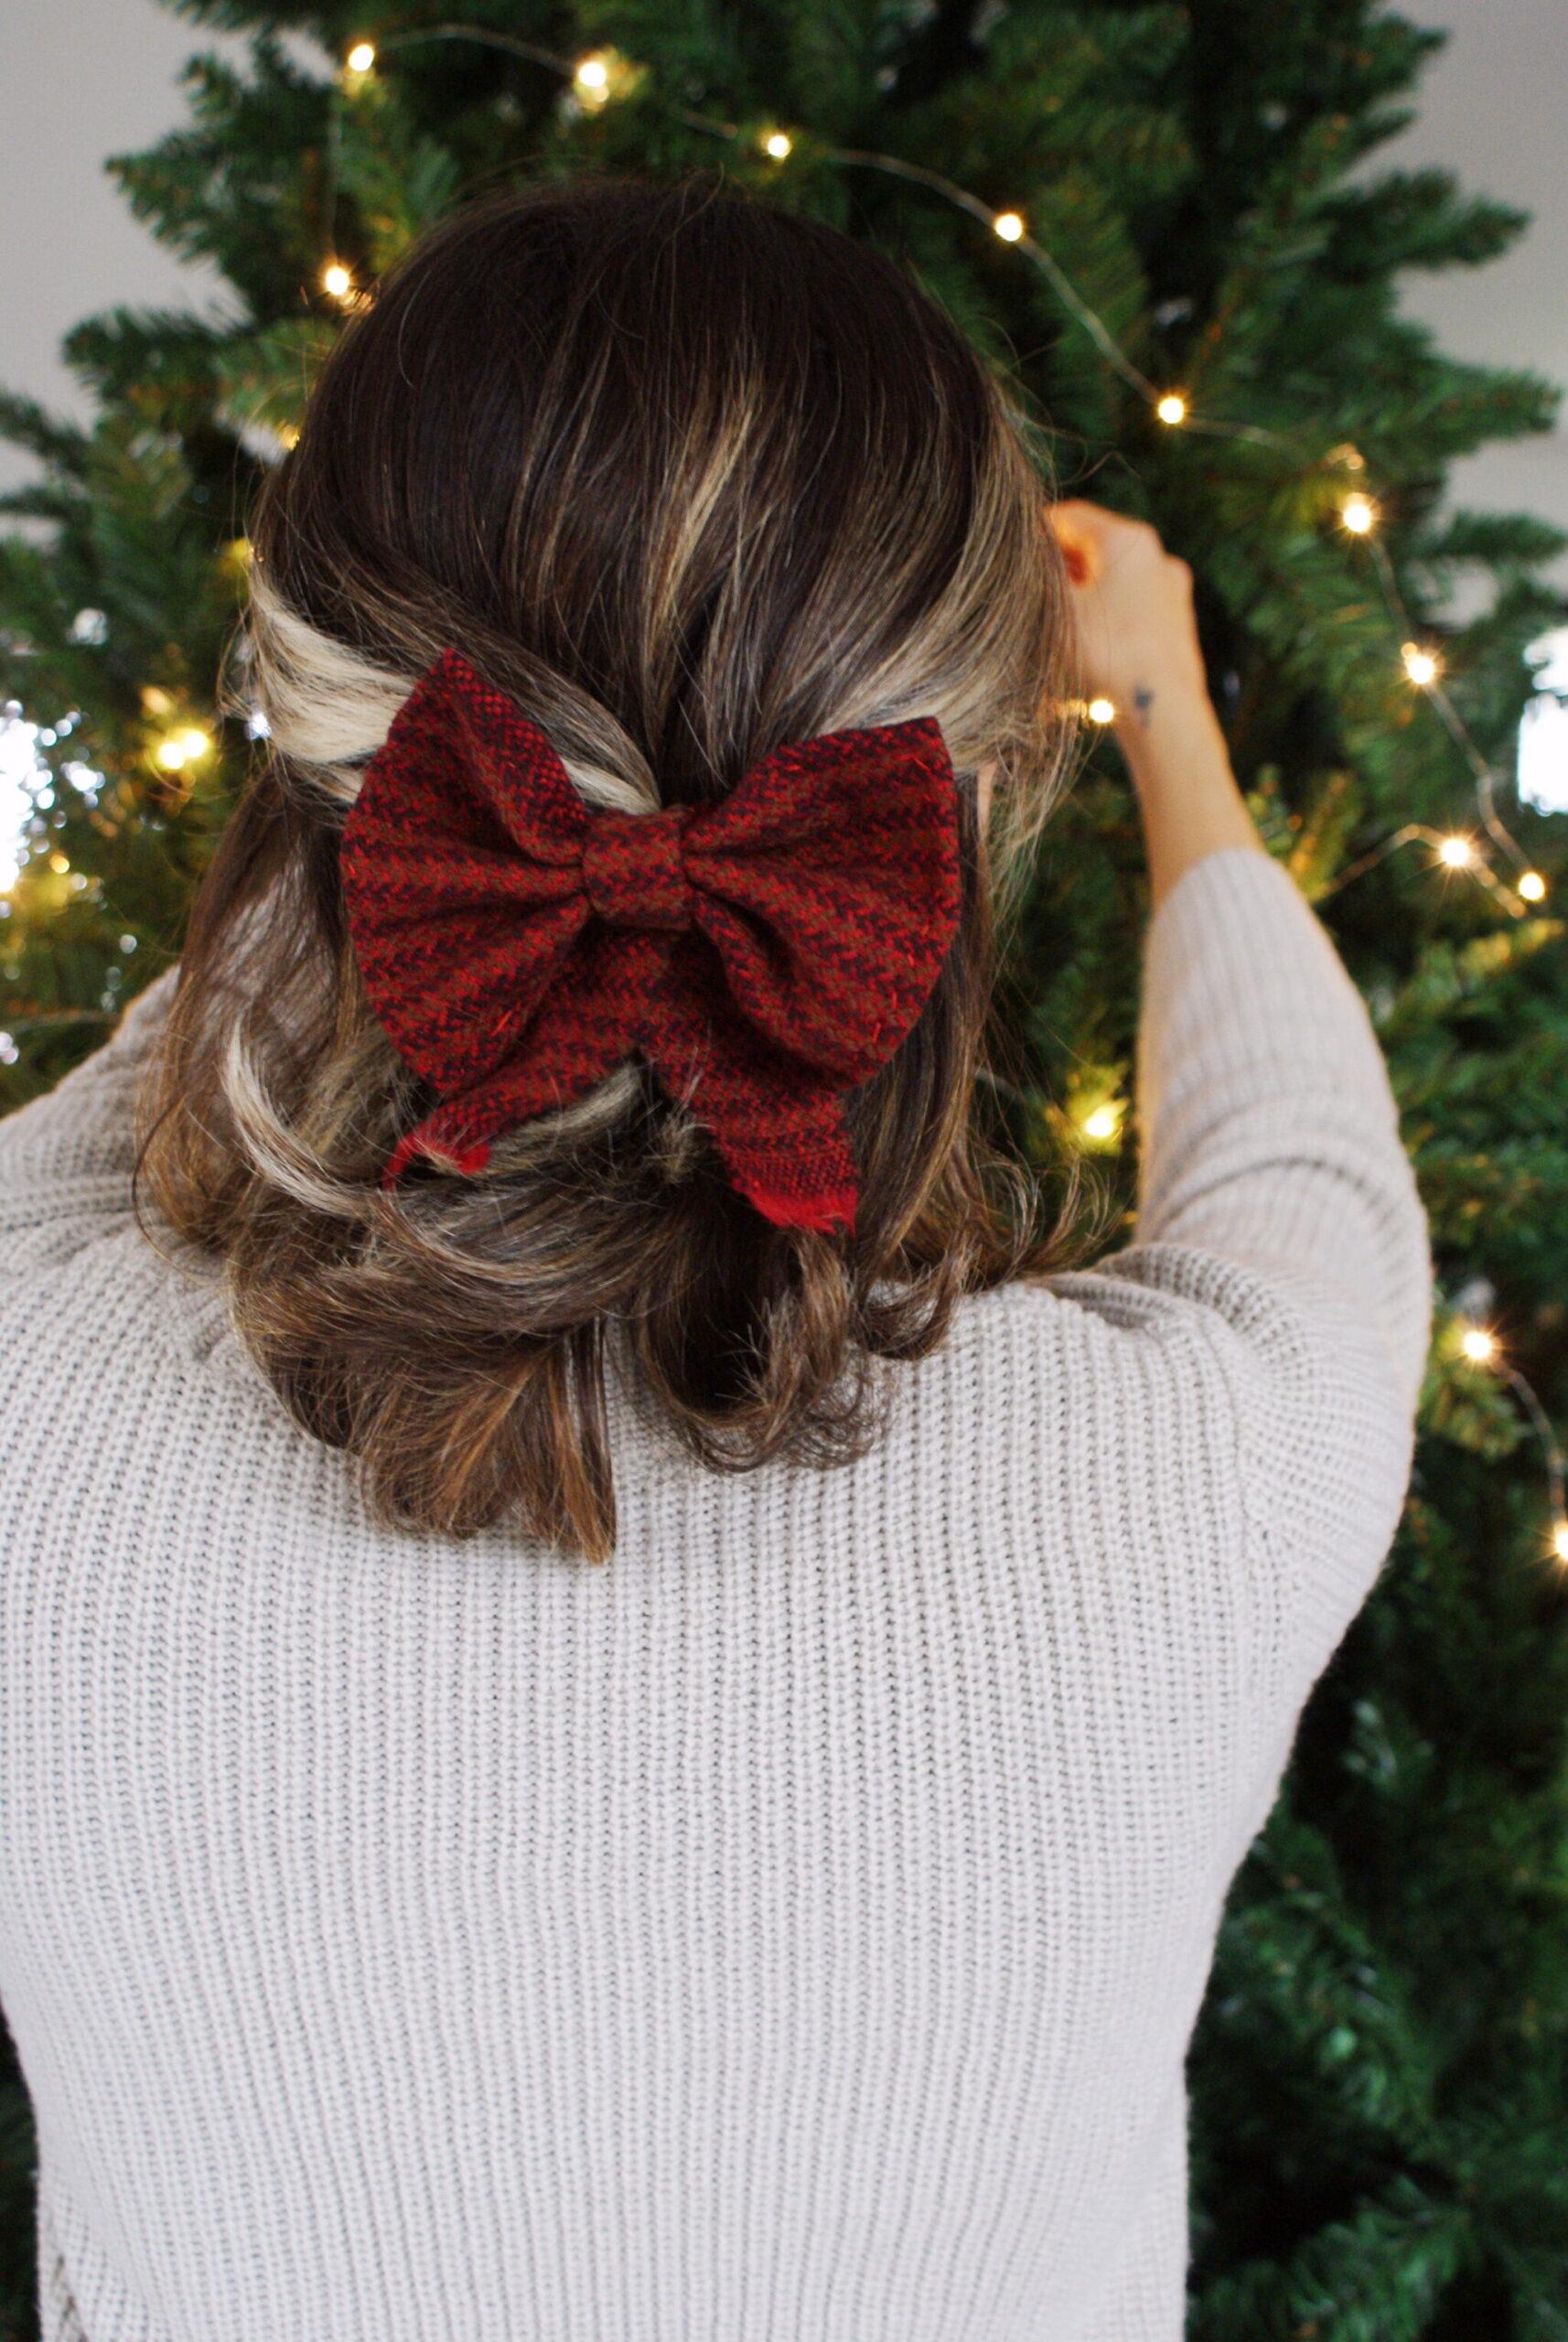 fermaglio fiocco capelli lana tartan fai da te facile tutorial